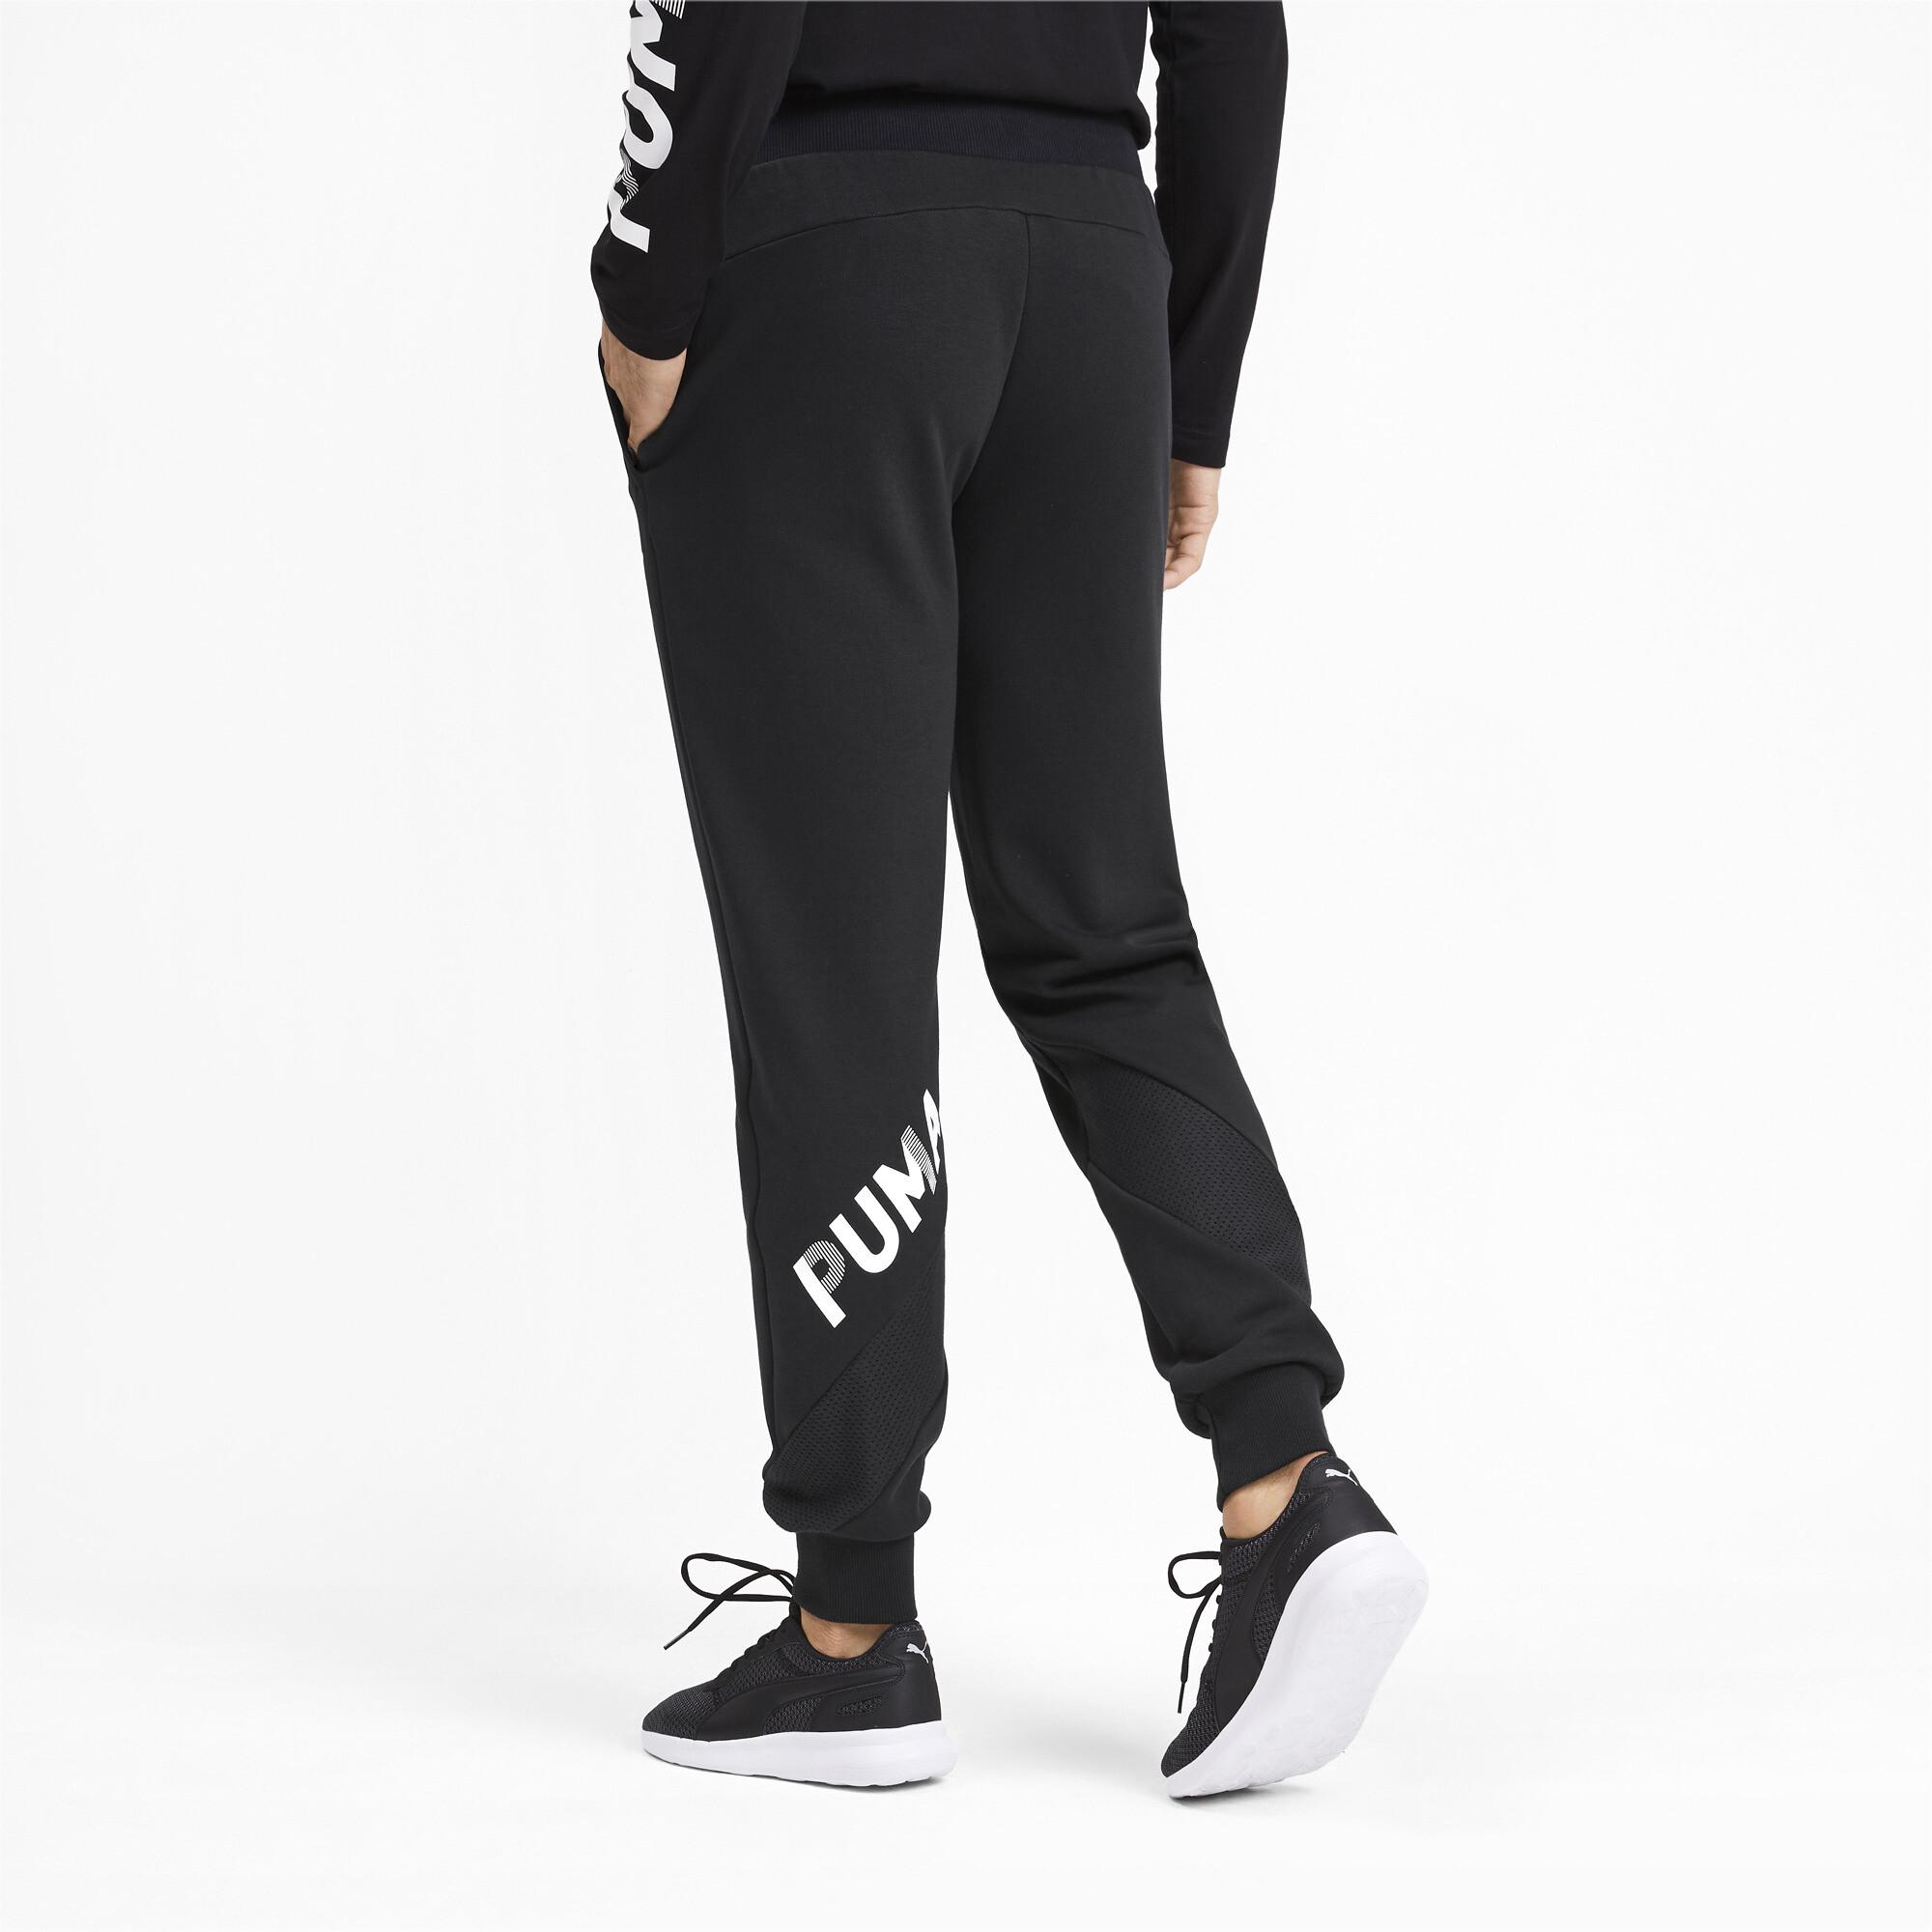 PUMA-Modern-Sports-Men-039-s-Sweatpants-Men-Knitted-Pants-Basics thumbnail 10